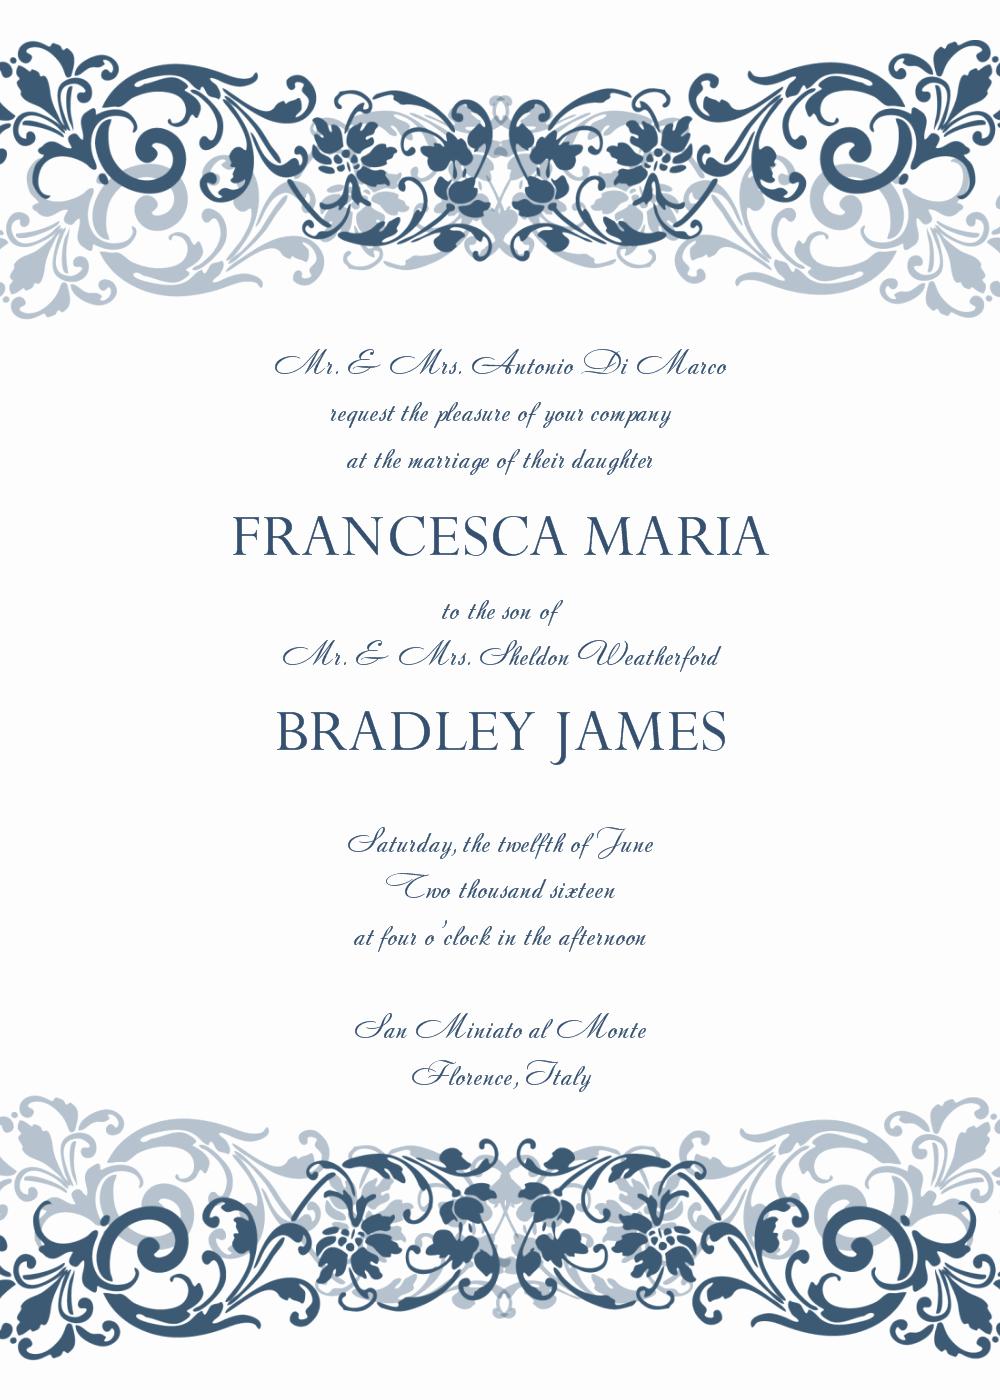 Free Wedding Templates Microsoft Word Best Of 8 Free Wedding Invitation Templates Excel Pdf formats